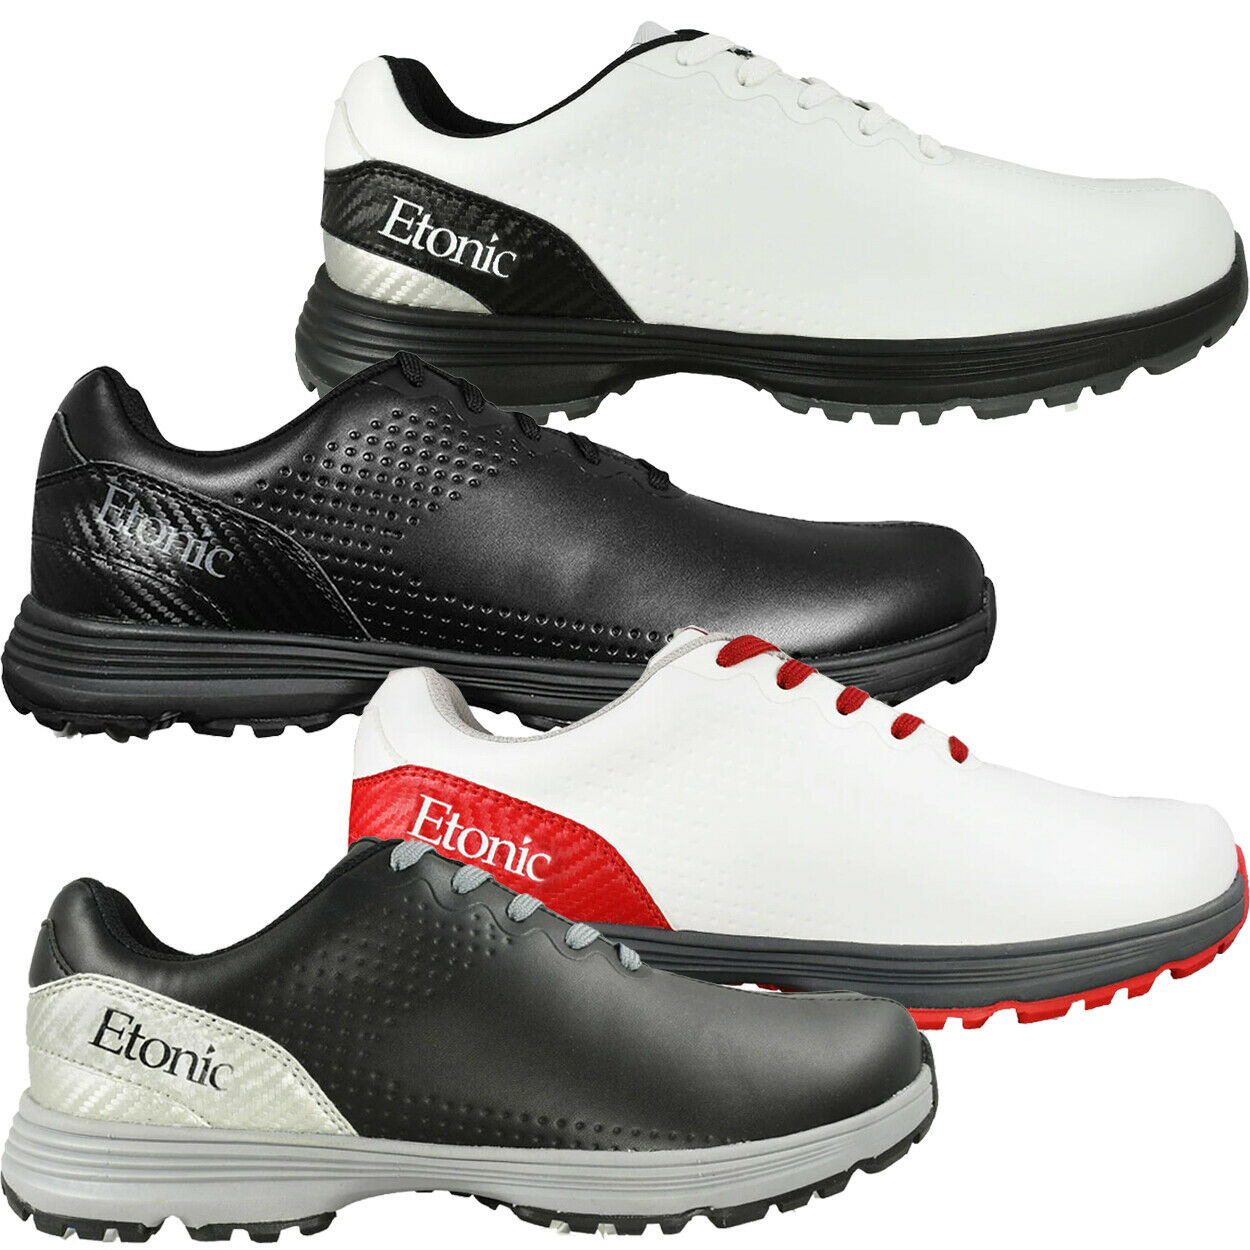 Etonic Men's Stabilizer 7-Spike รองเท้ากอล์ฟกันน้ำใหม่เอี่ยม - C'mon » TikTokJa Video Downloader